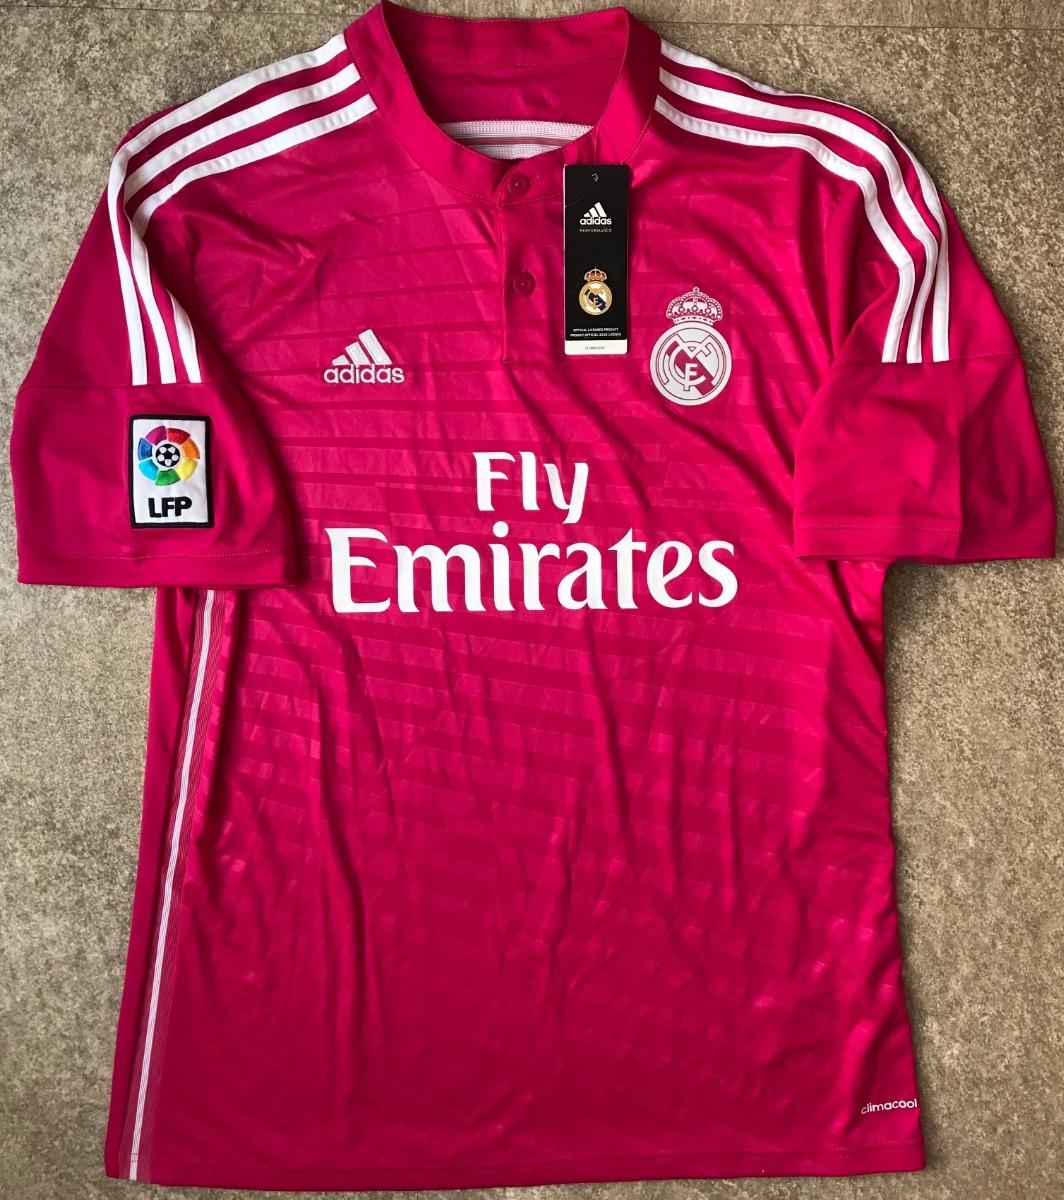 632635e3d5a82 ... Clubes Españoles · Real Madrid. Compartir. Compartir. Vender uno igual.  jersey ronaldo real madrid rosa 2014 chicharito méxico. Cargando zoom.